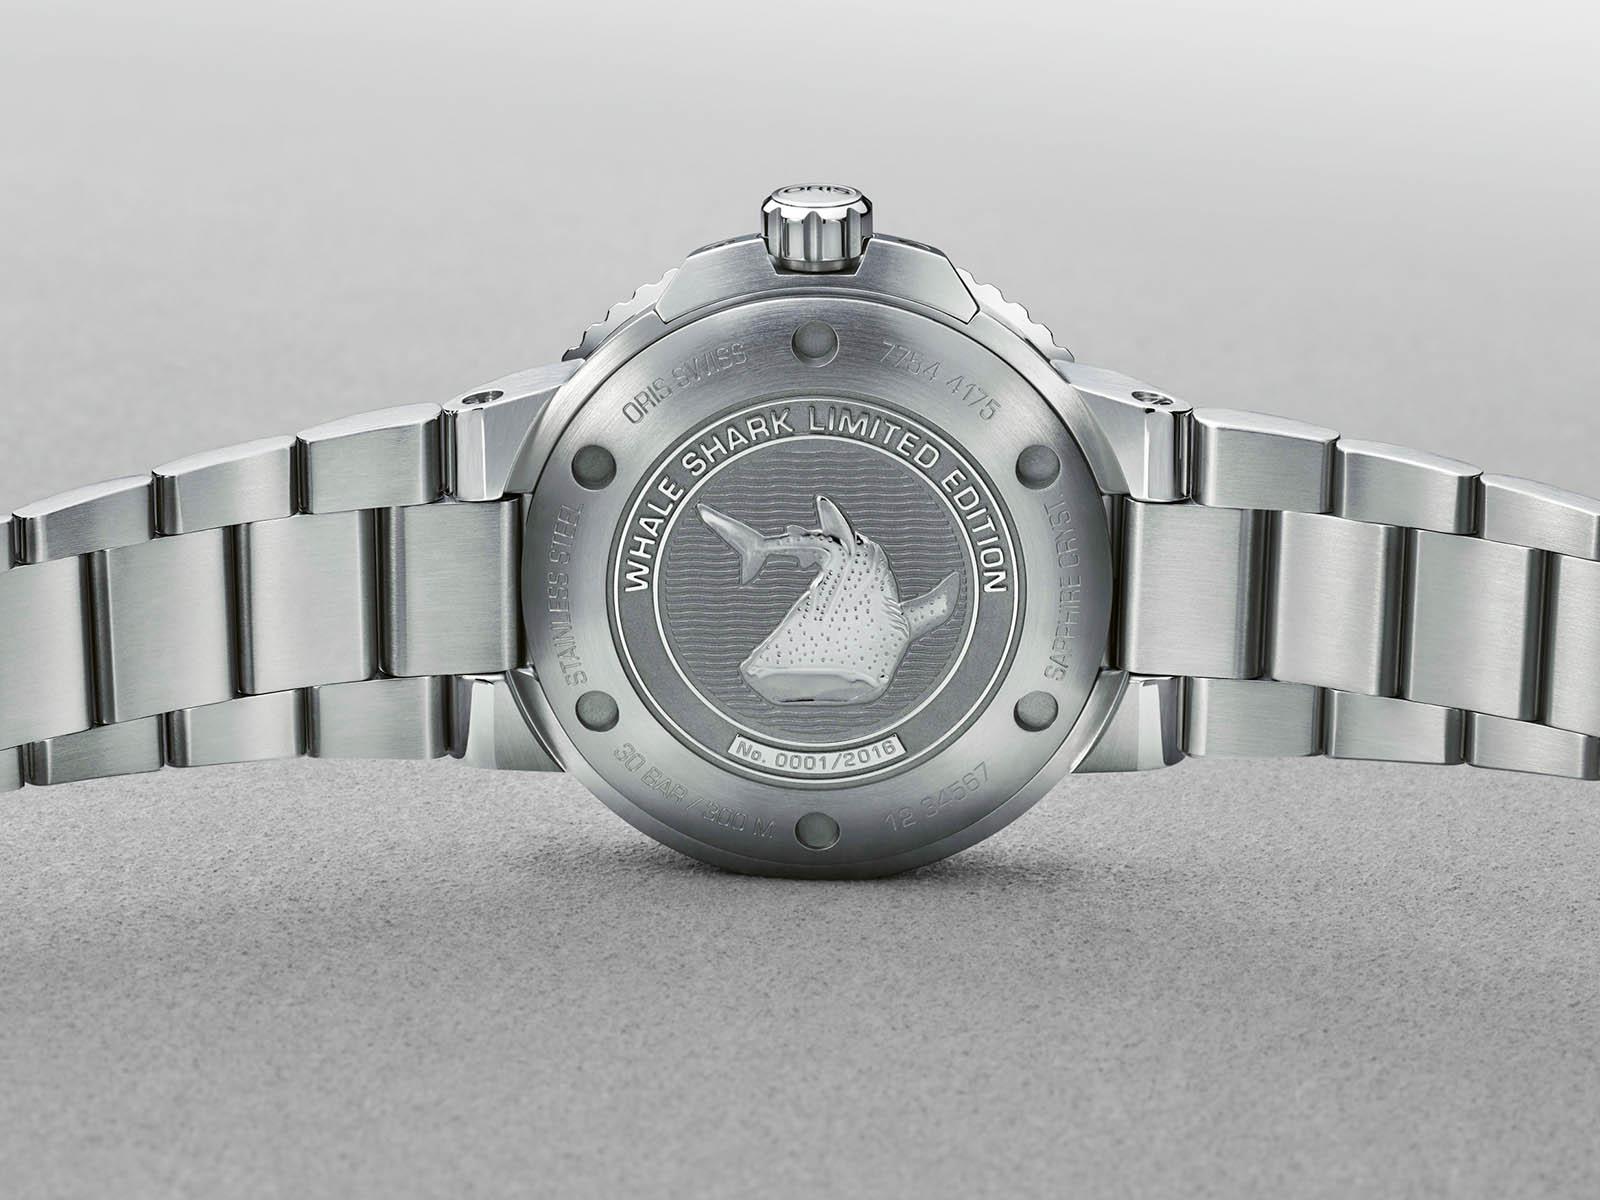 798-7754-4175-set-mb-oris-aquis-gmt-date-whale-shark-limited-edition-10.jpg